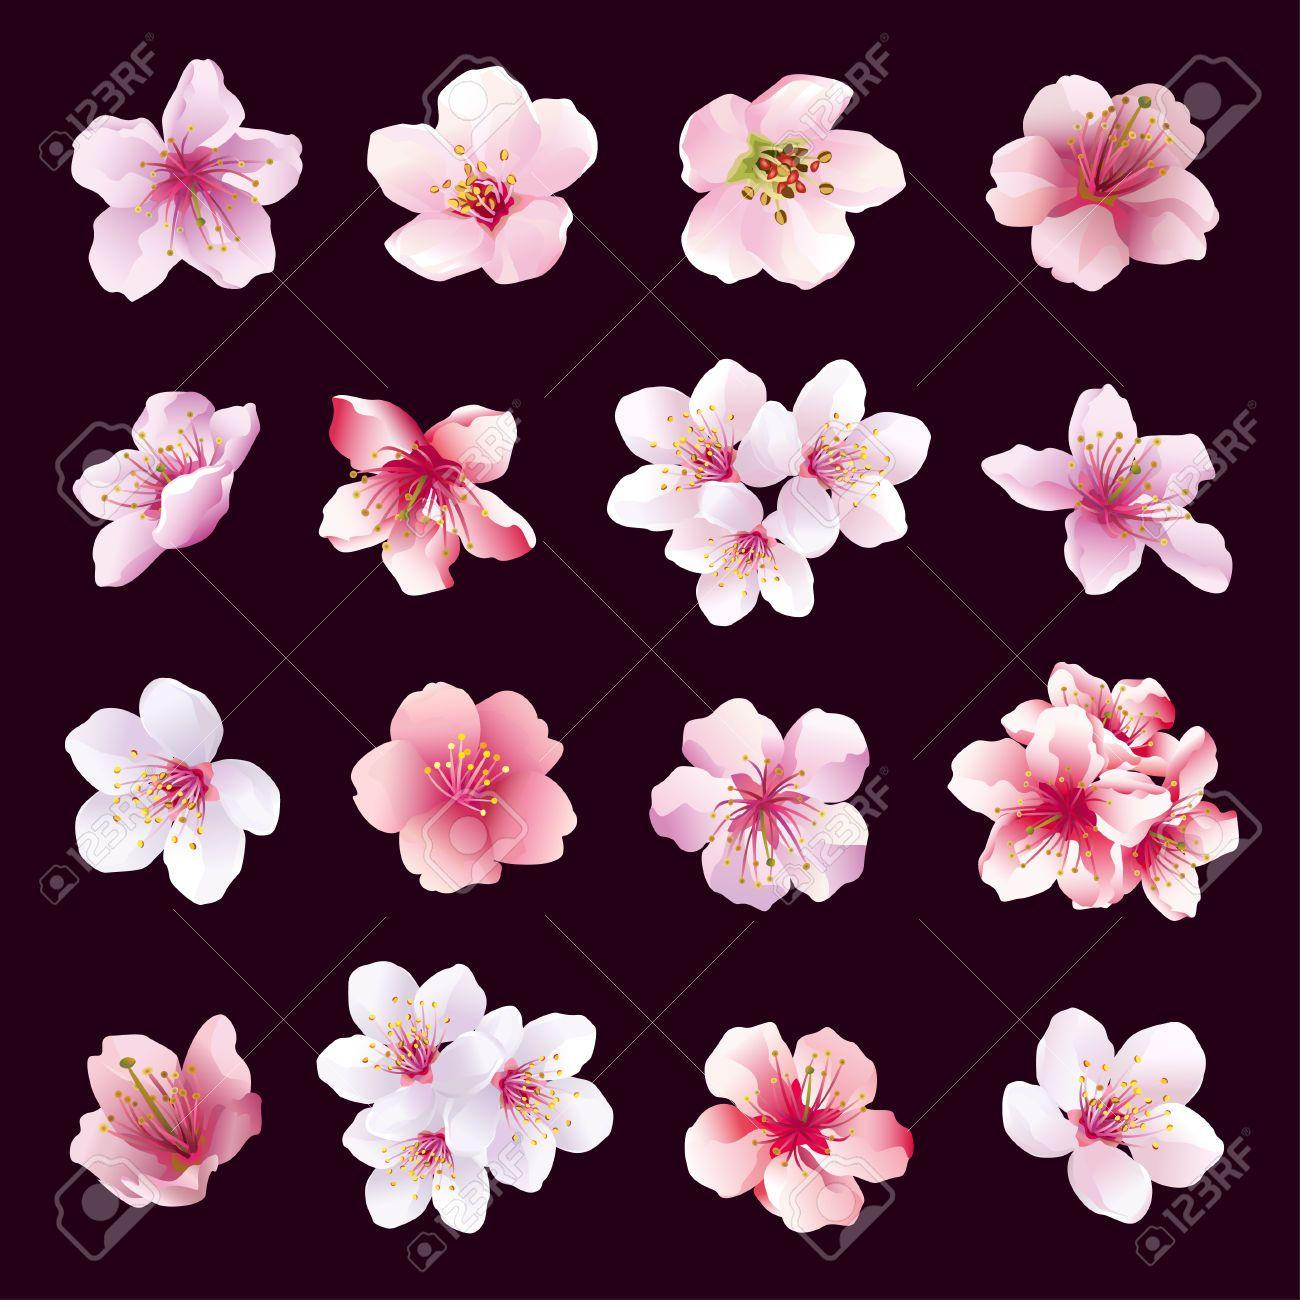 R Sultats Google Recherche D Images Correspondant Http Previews 123rf Com Images Silvionka Silvio Cherry Blossom Art Blossom Tattoo Cherry Blossom Painting